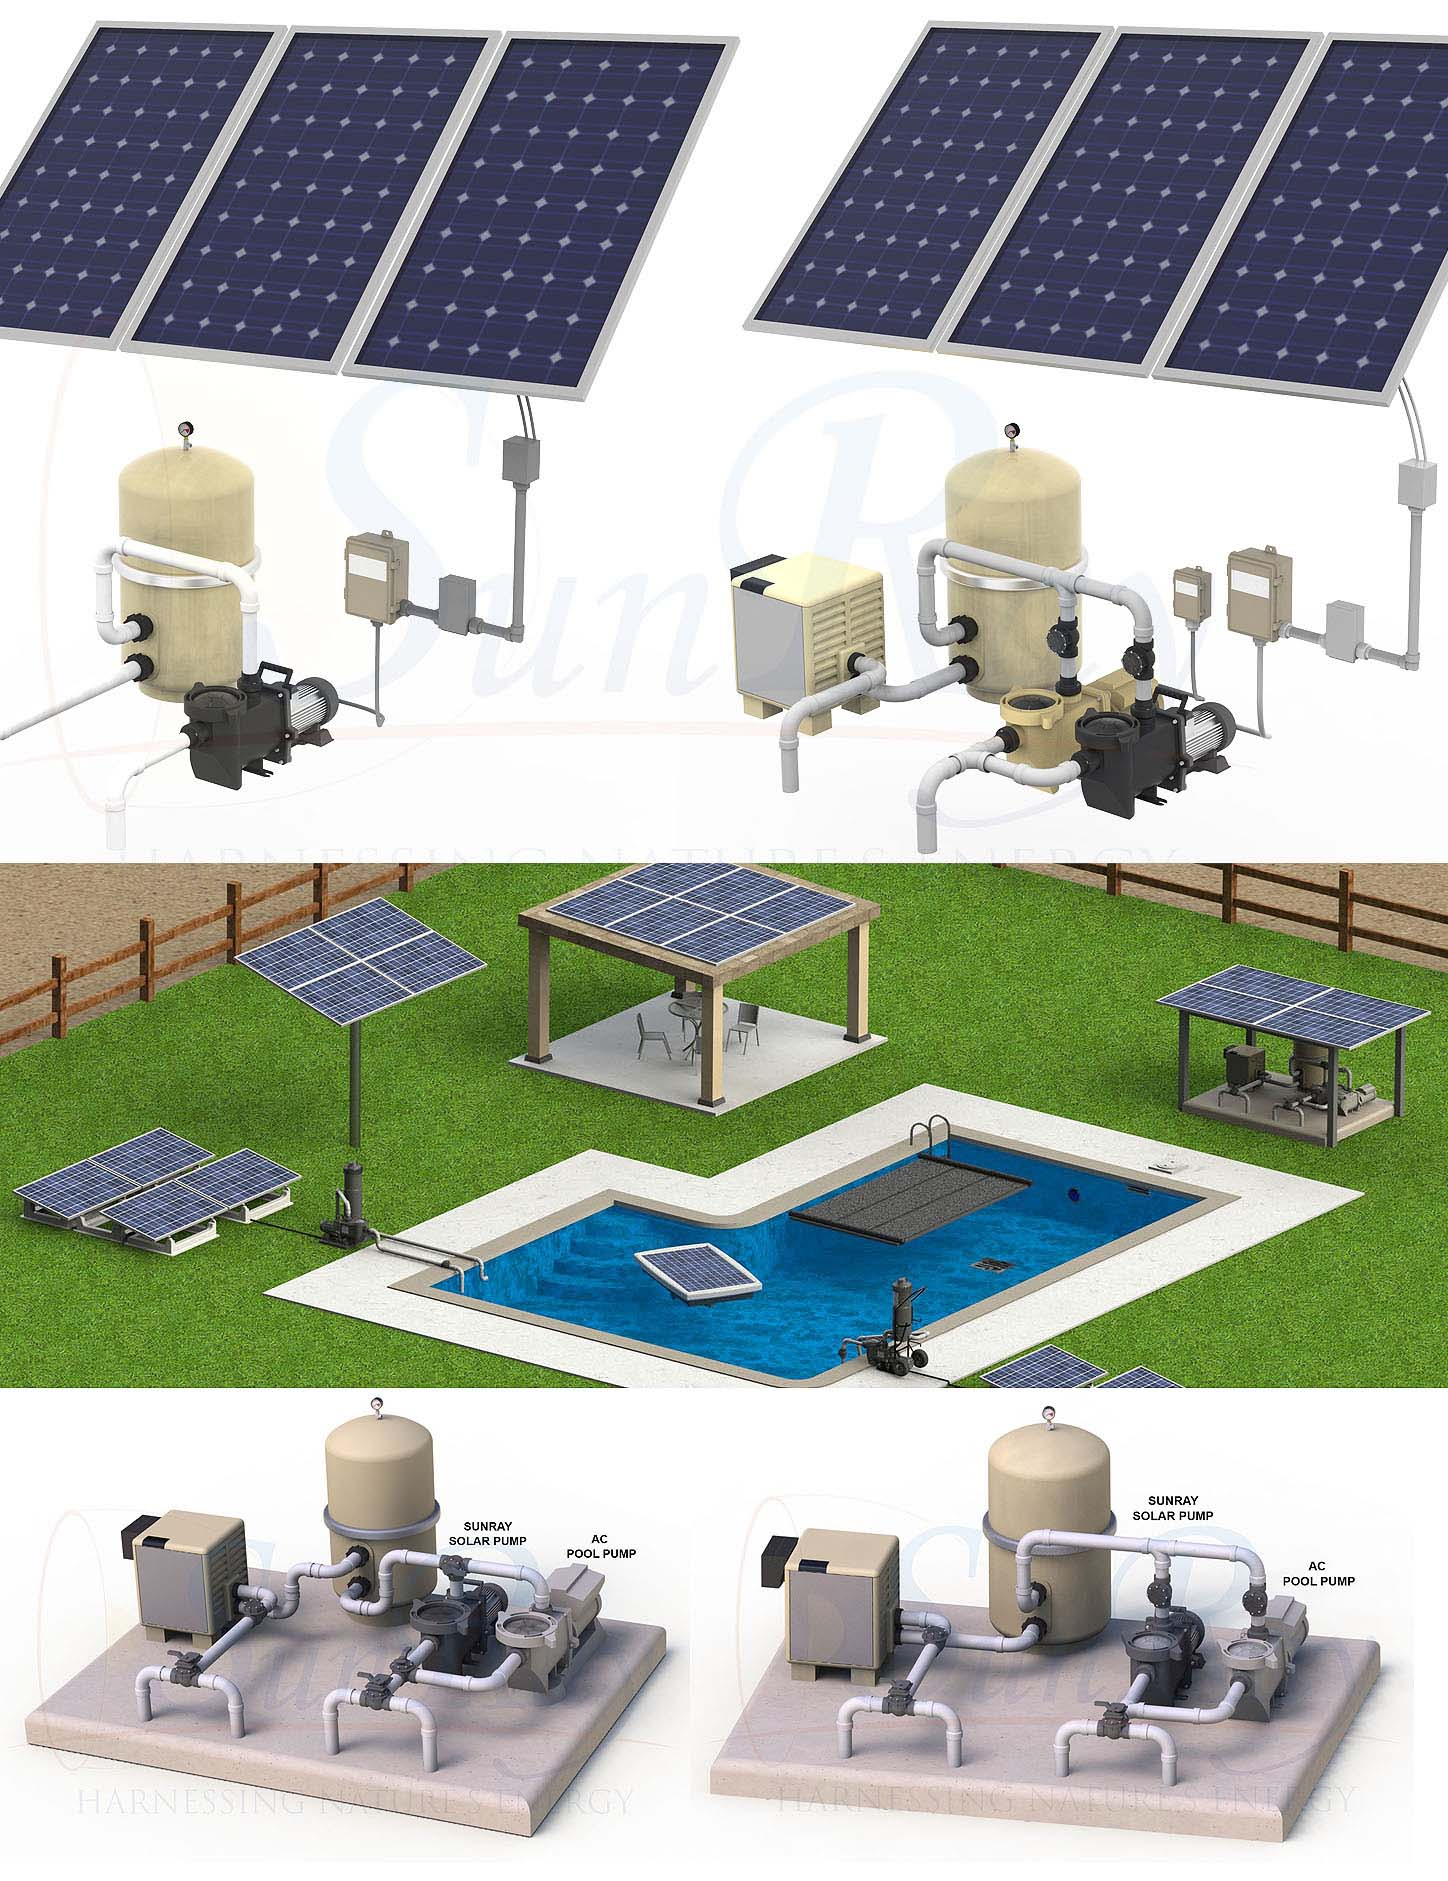 SunRay Solar Pool Pumps - Solar Powered Pool Pumps